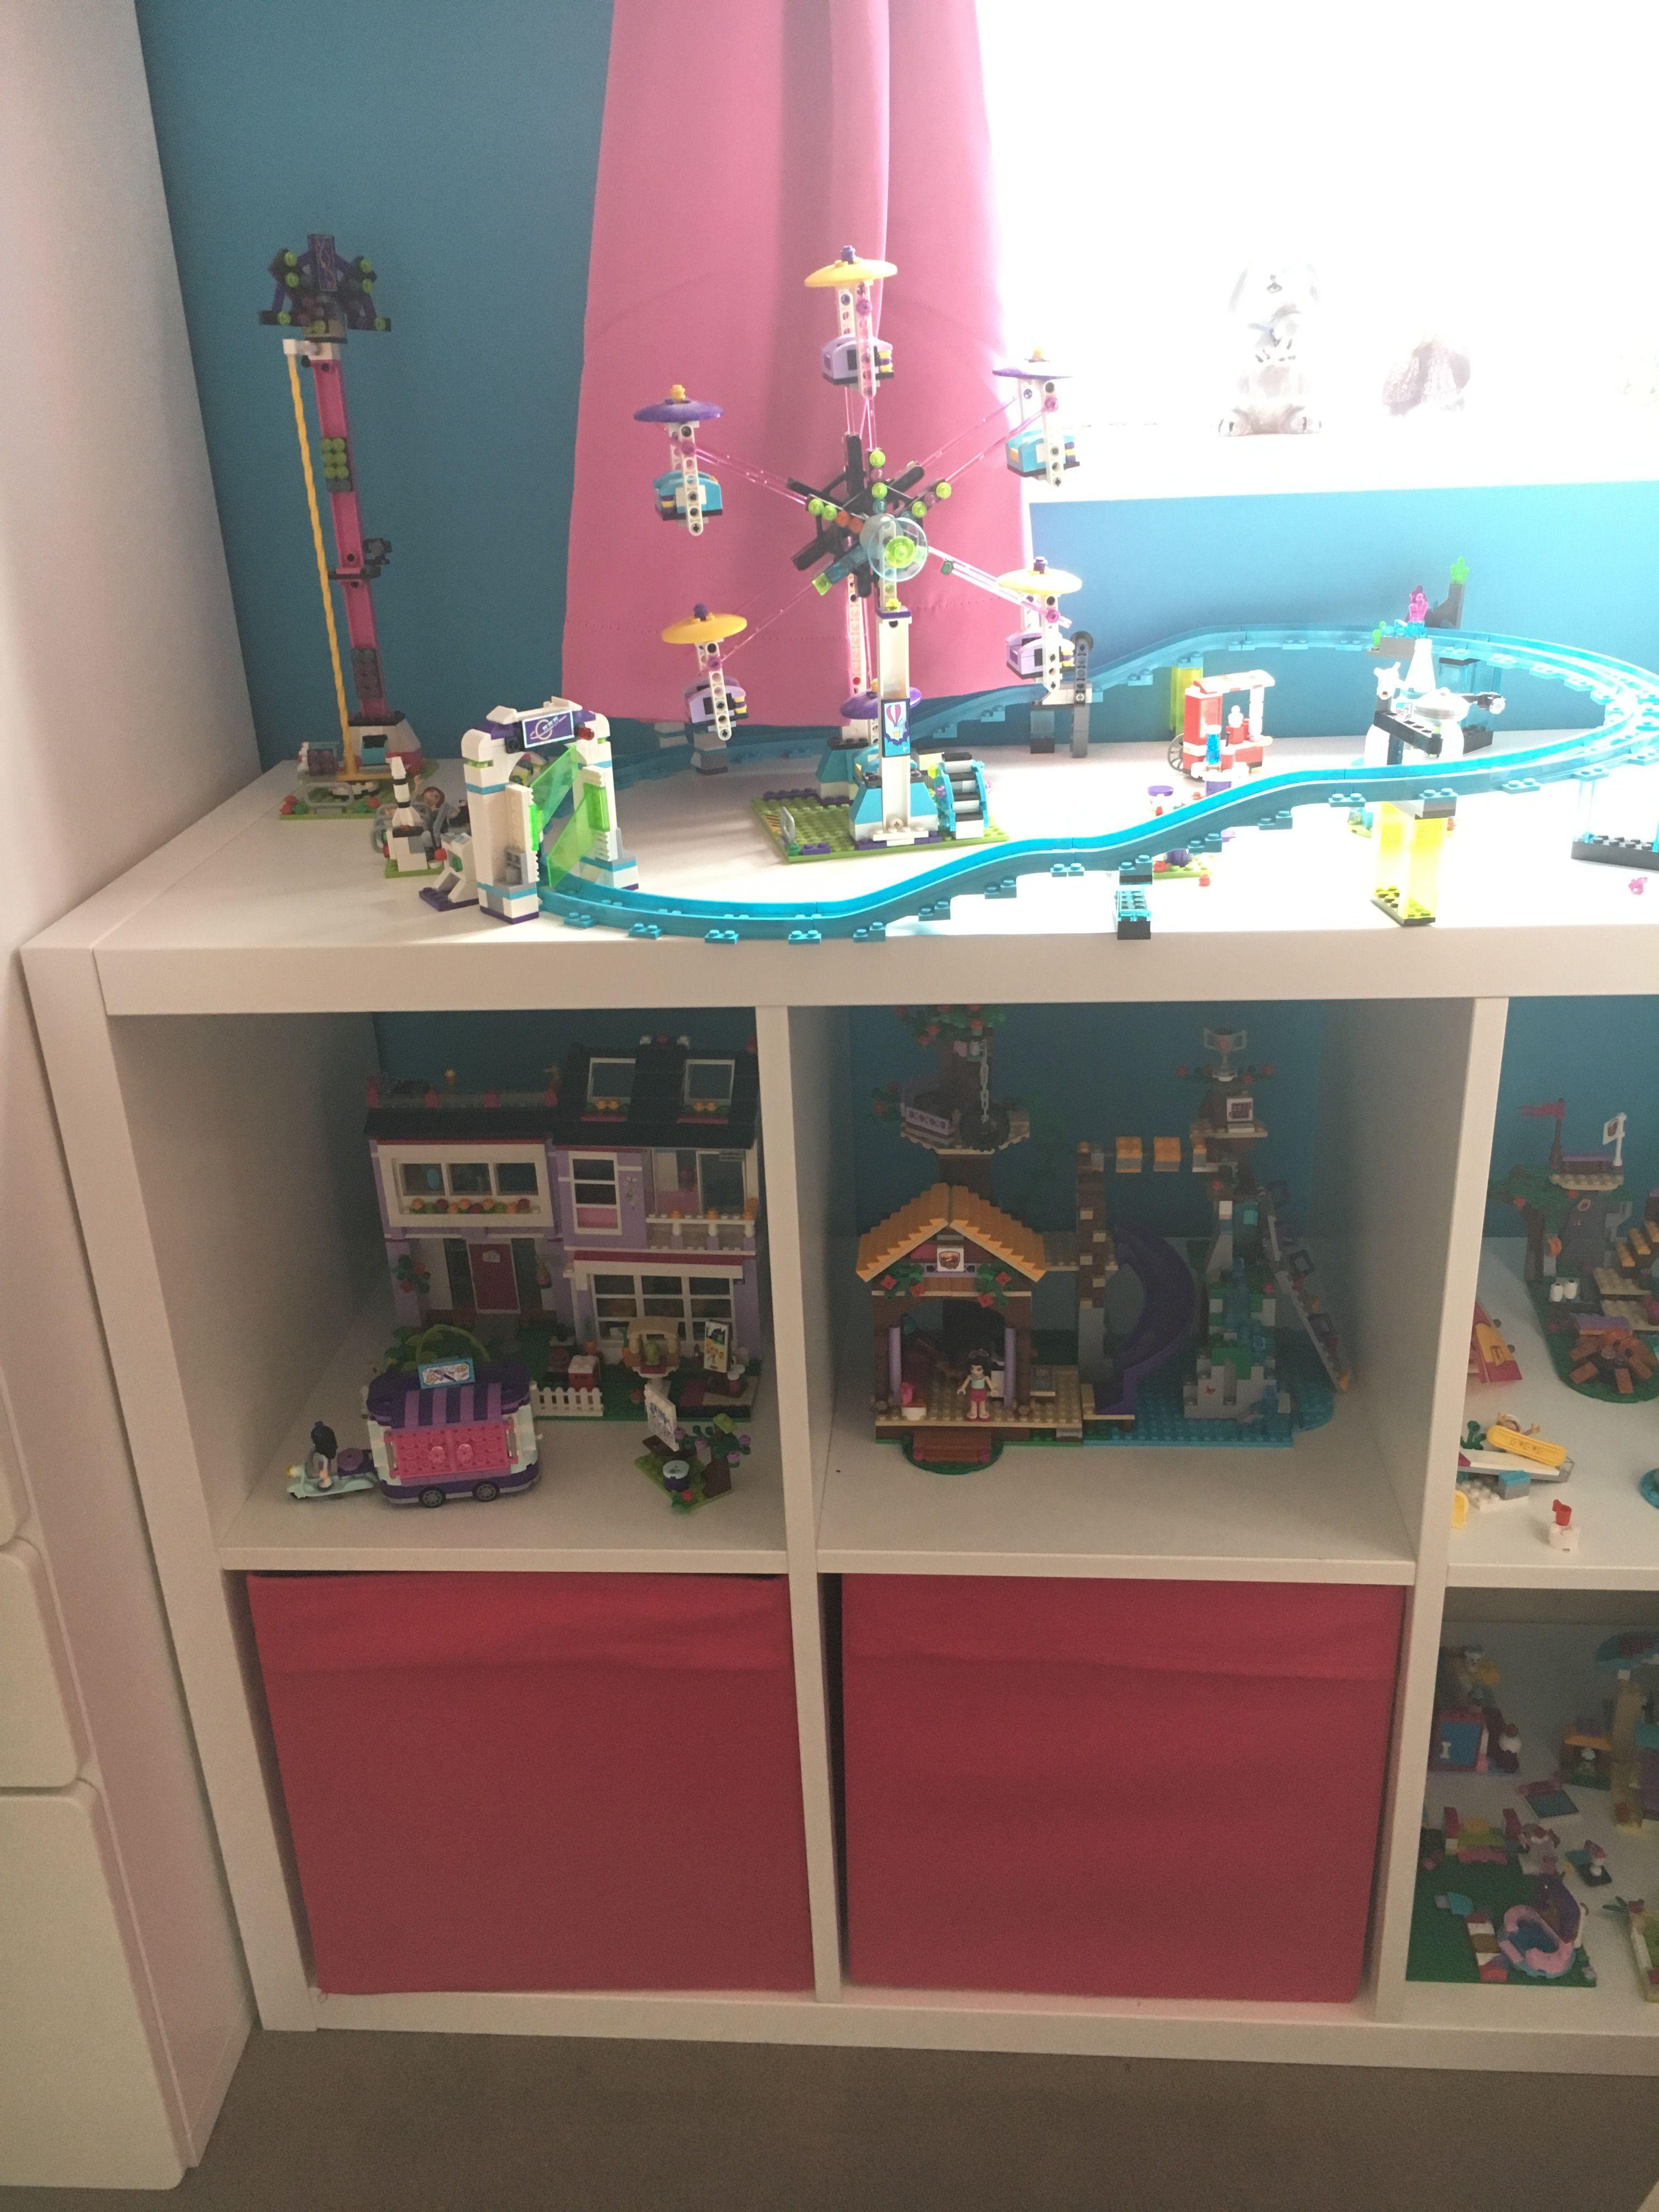 Ikea kallax shelving unit used to store Lego friends. The